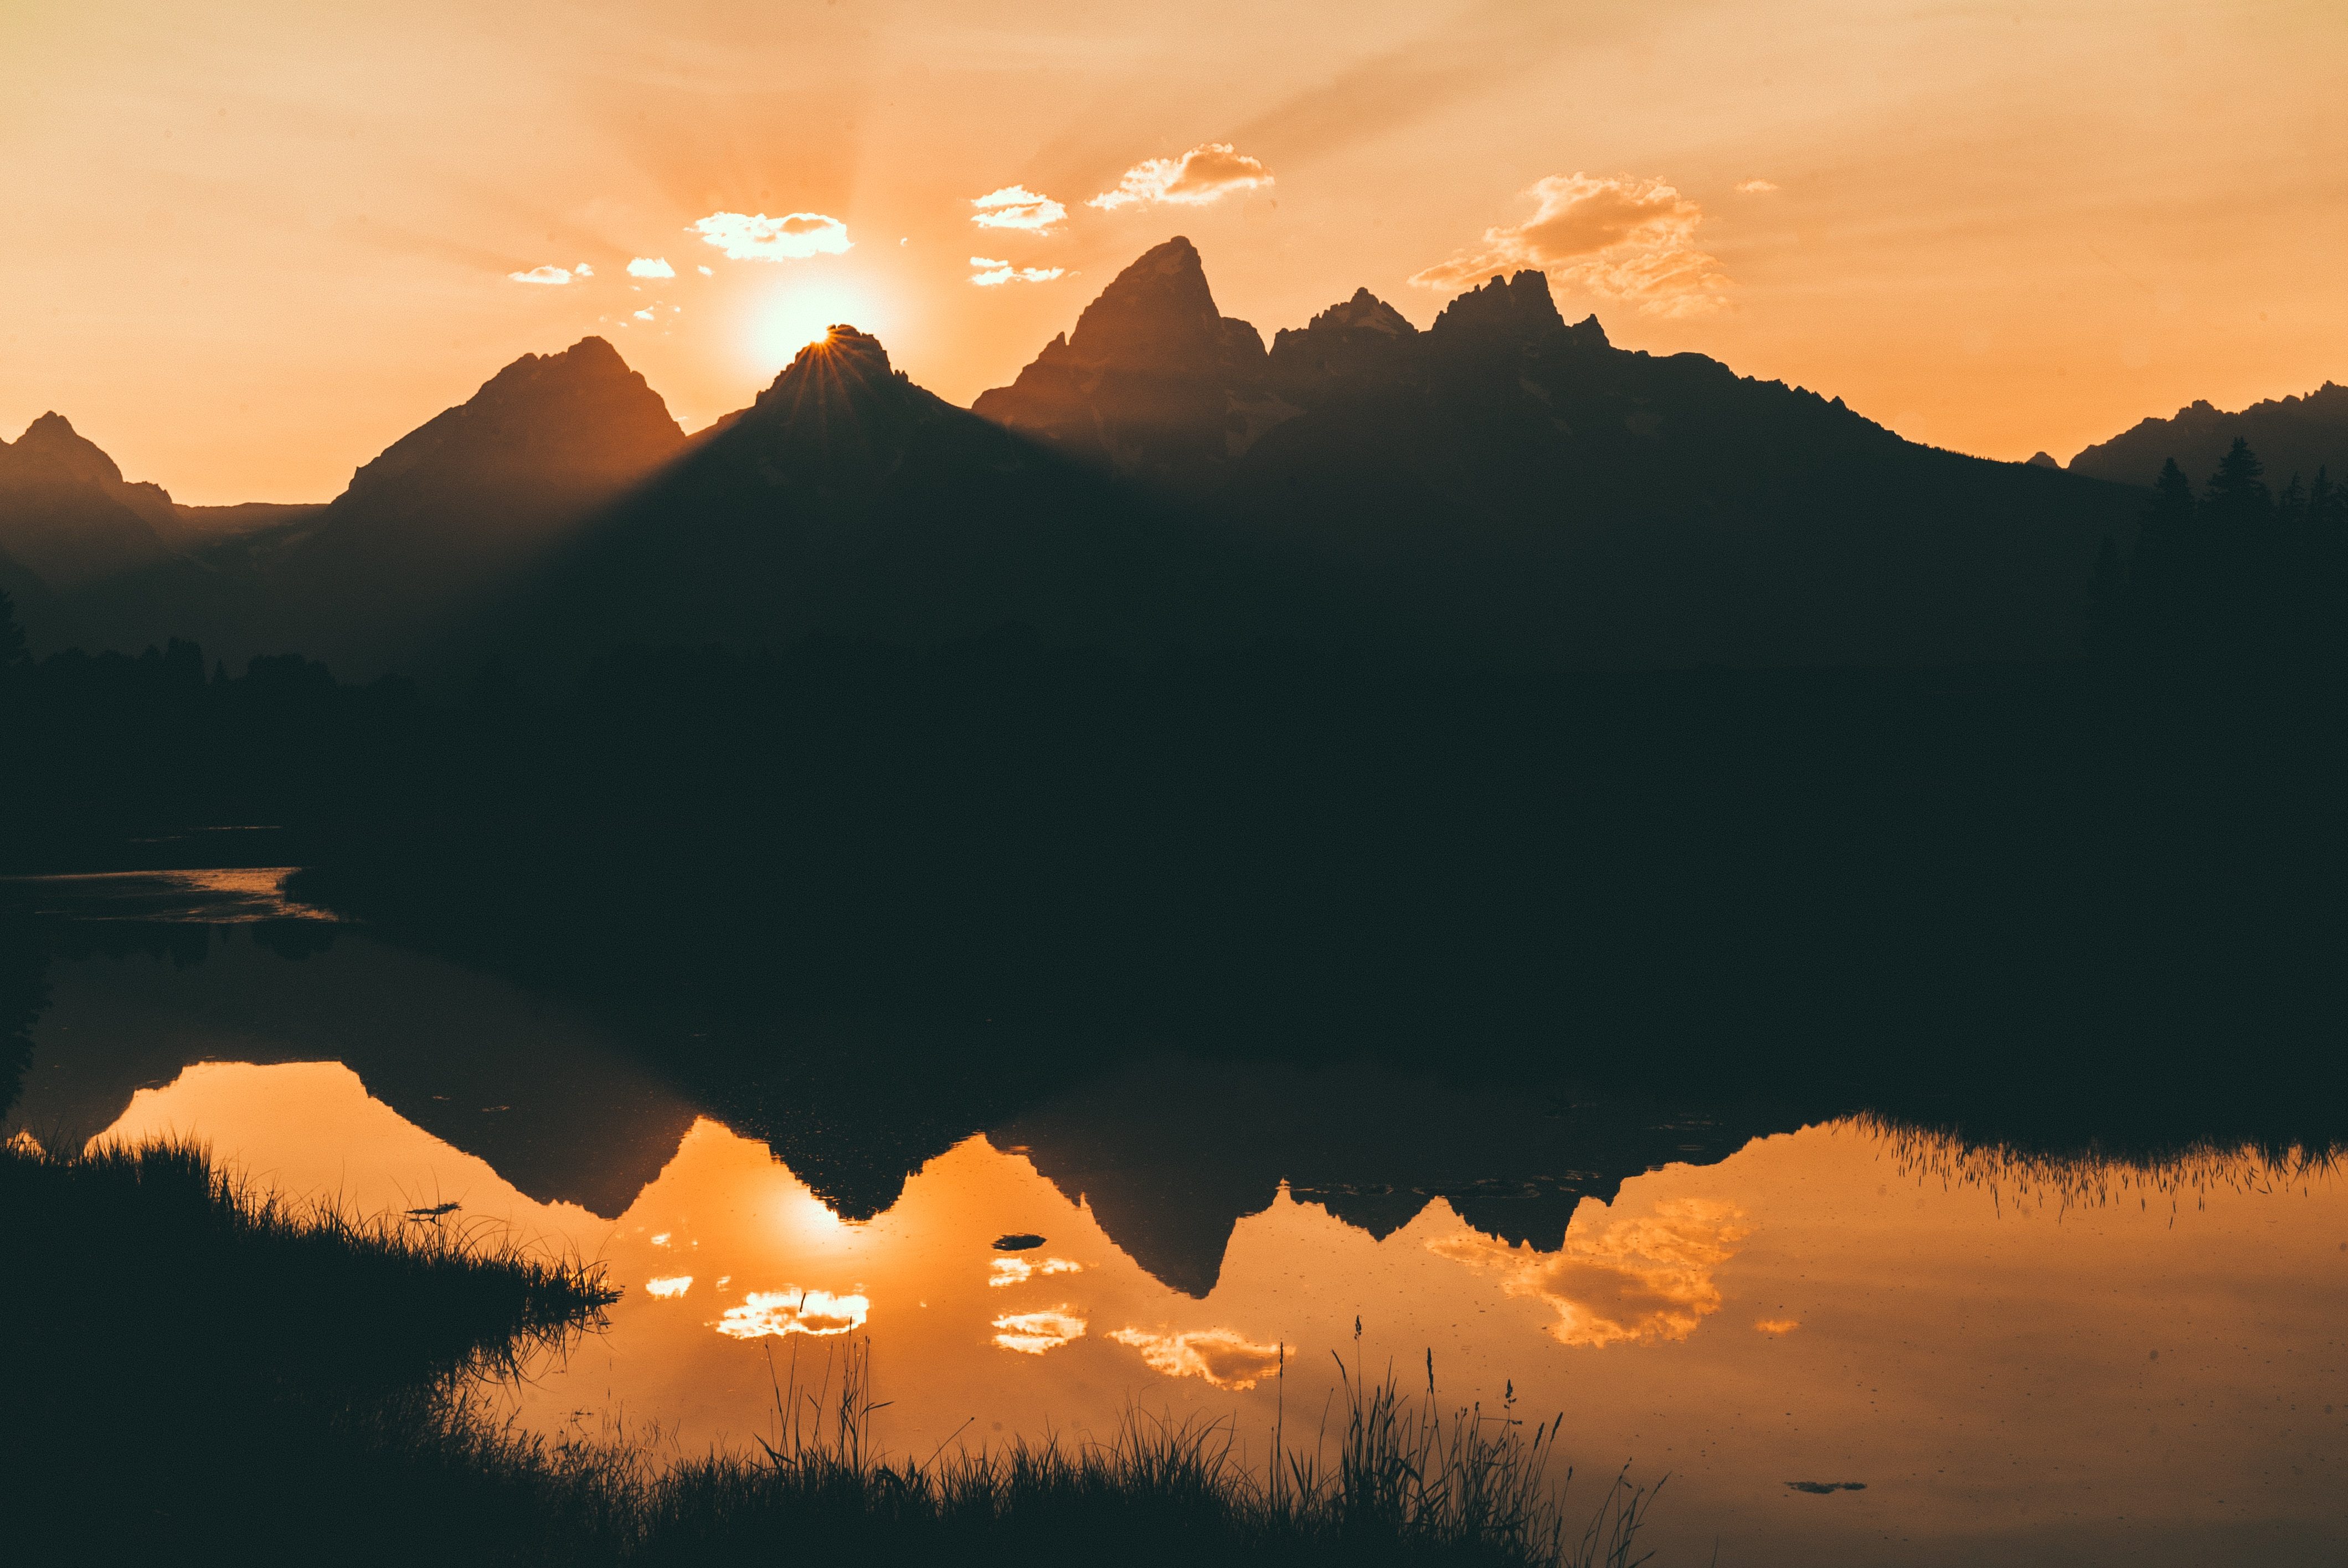 lake silhouette mountains beside 1574937890 - Lake Silhouette Mountains Beside -